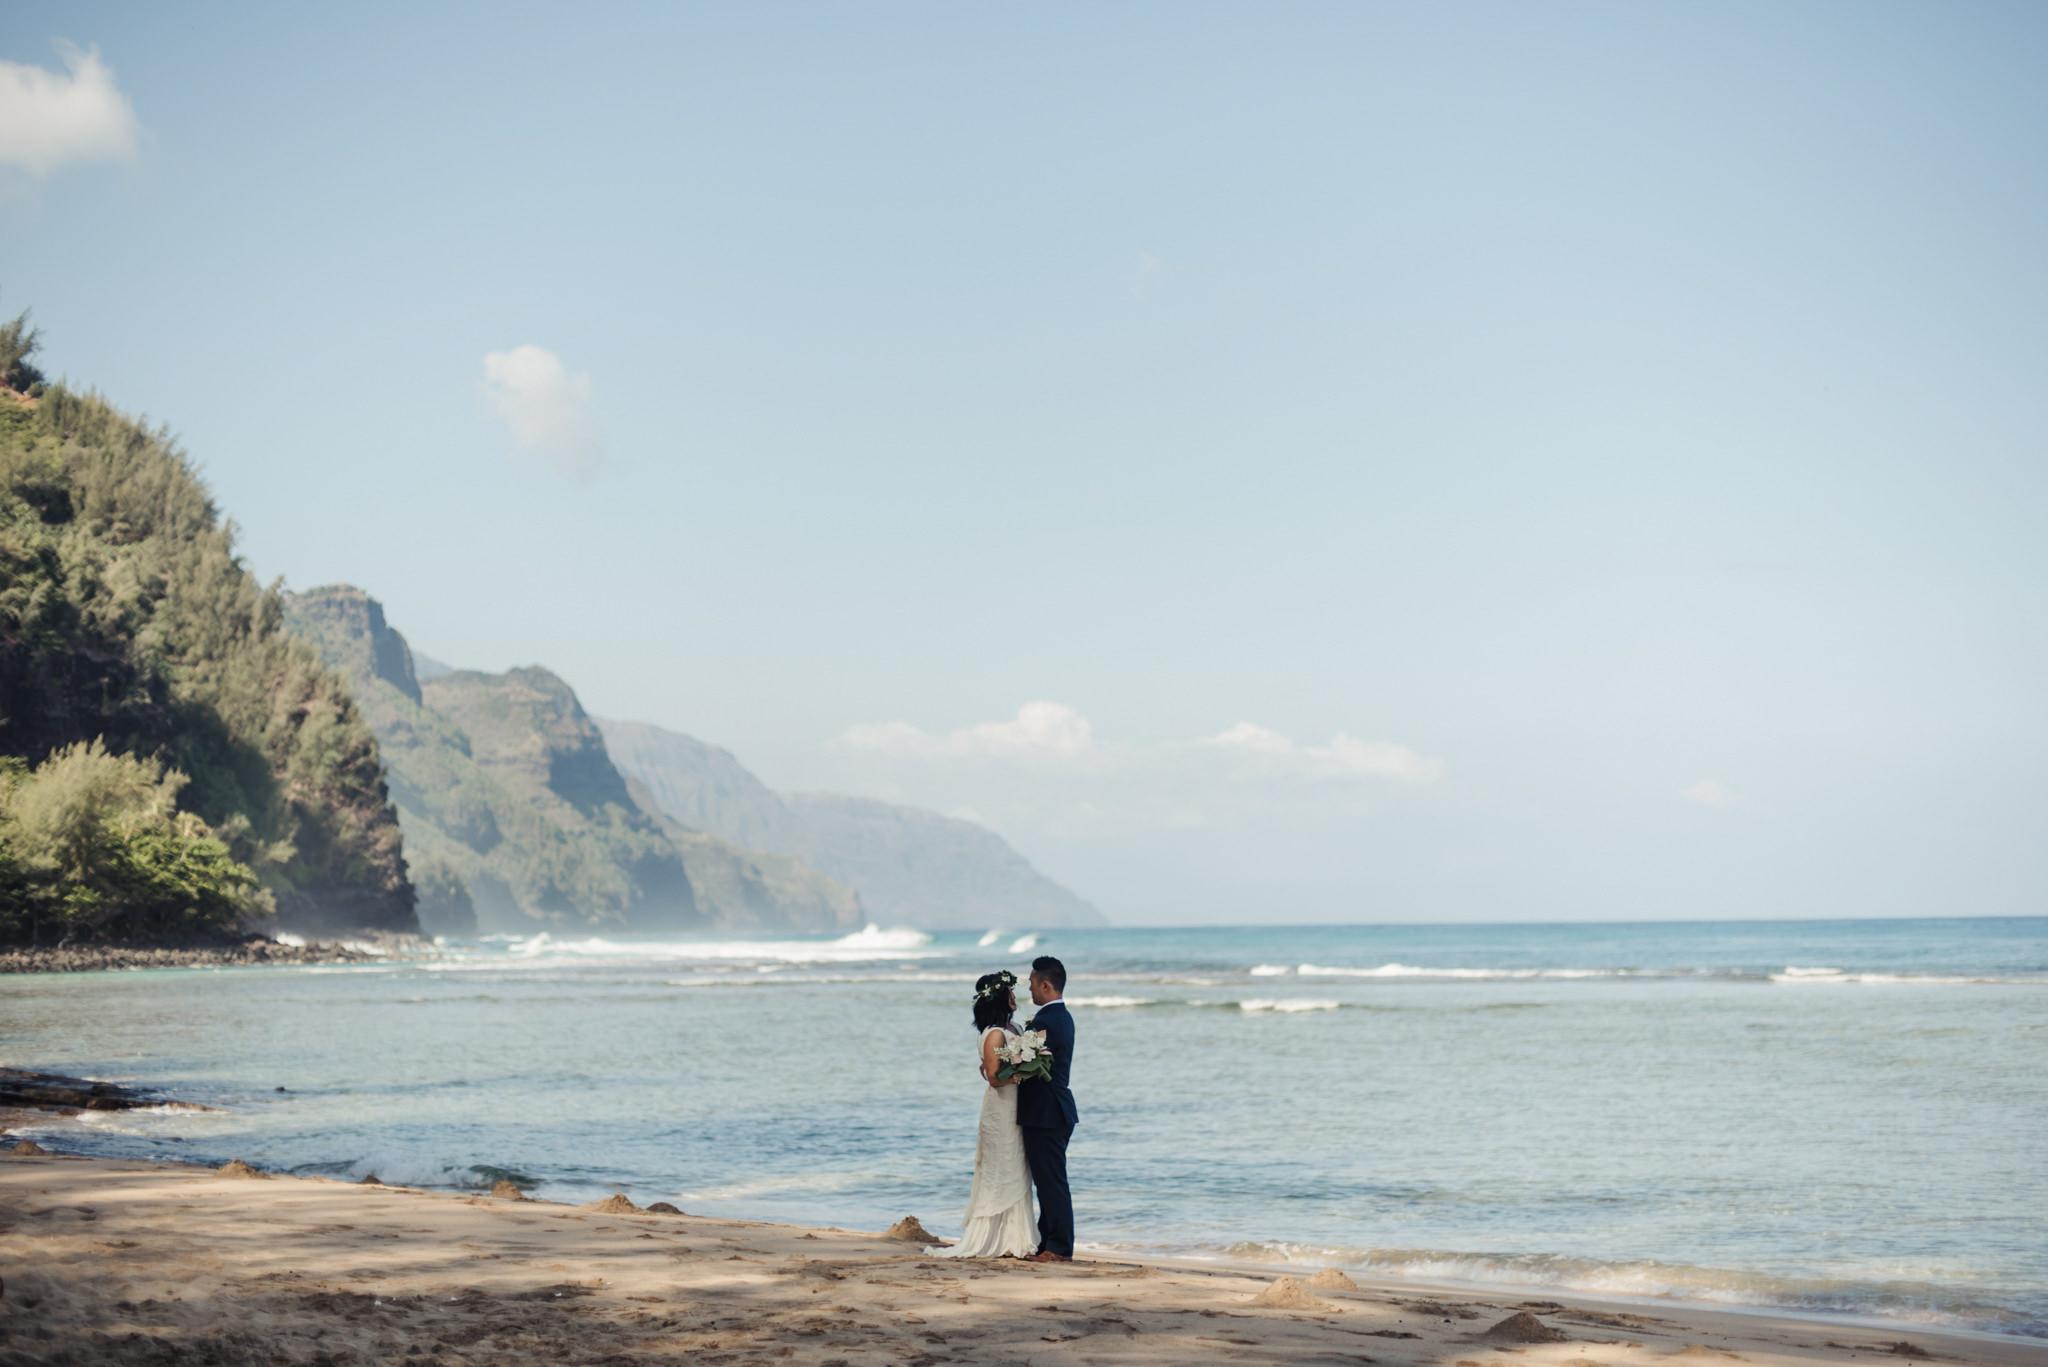 wedding portrait on ke'e beach with na pali coast in background